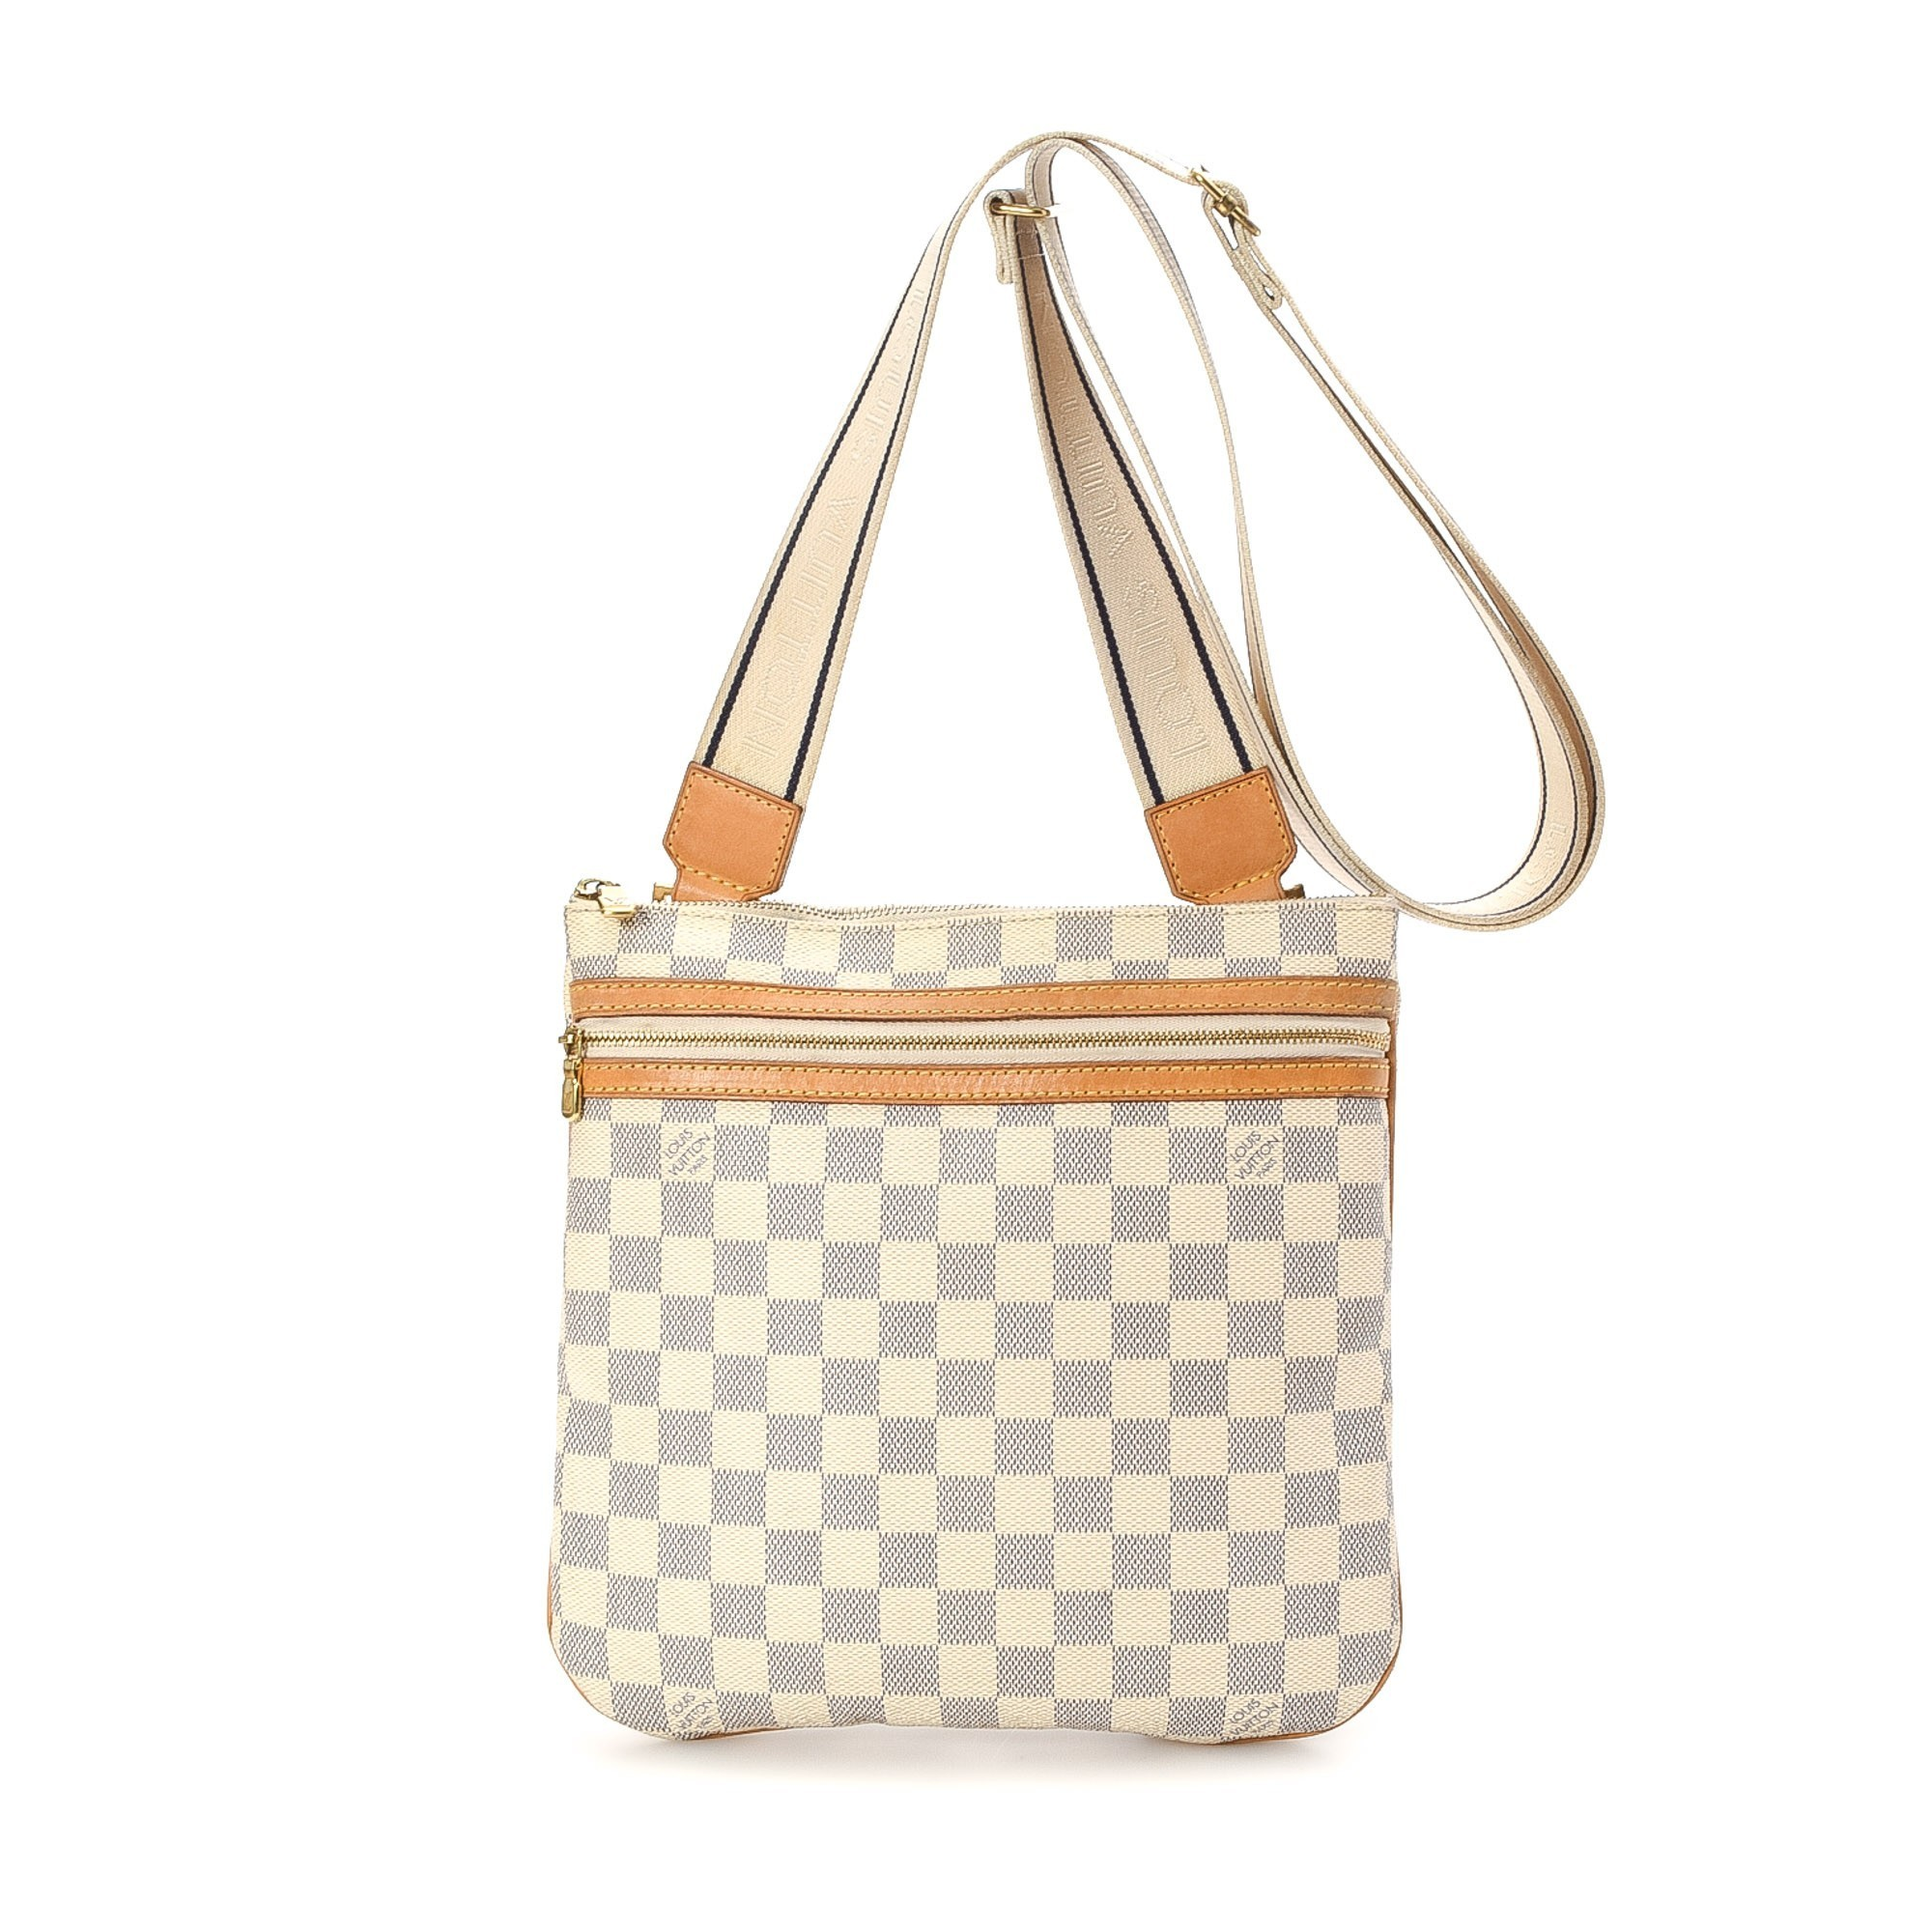 Louis Vuitton White Damier Crossbody Bag Travel Diaper Bag